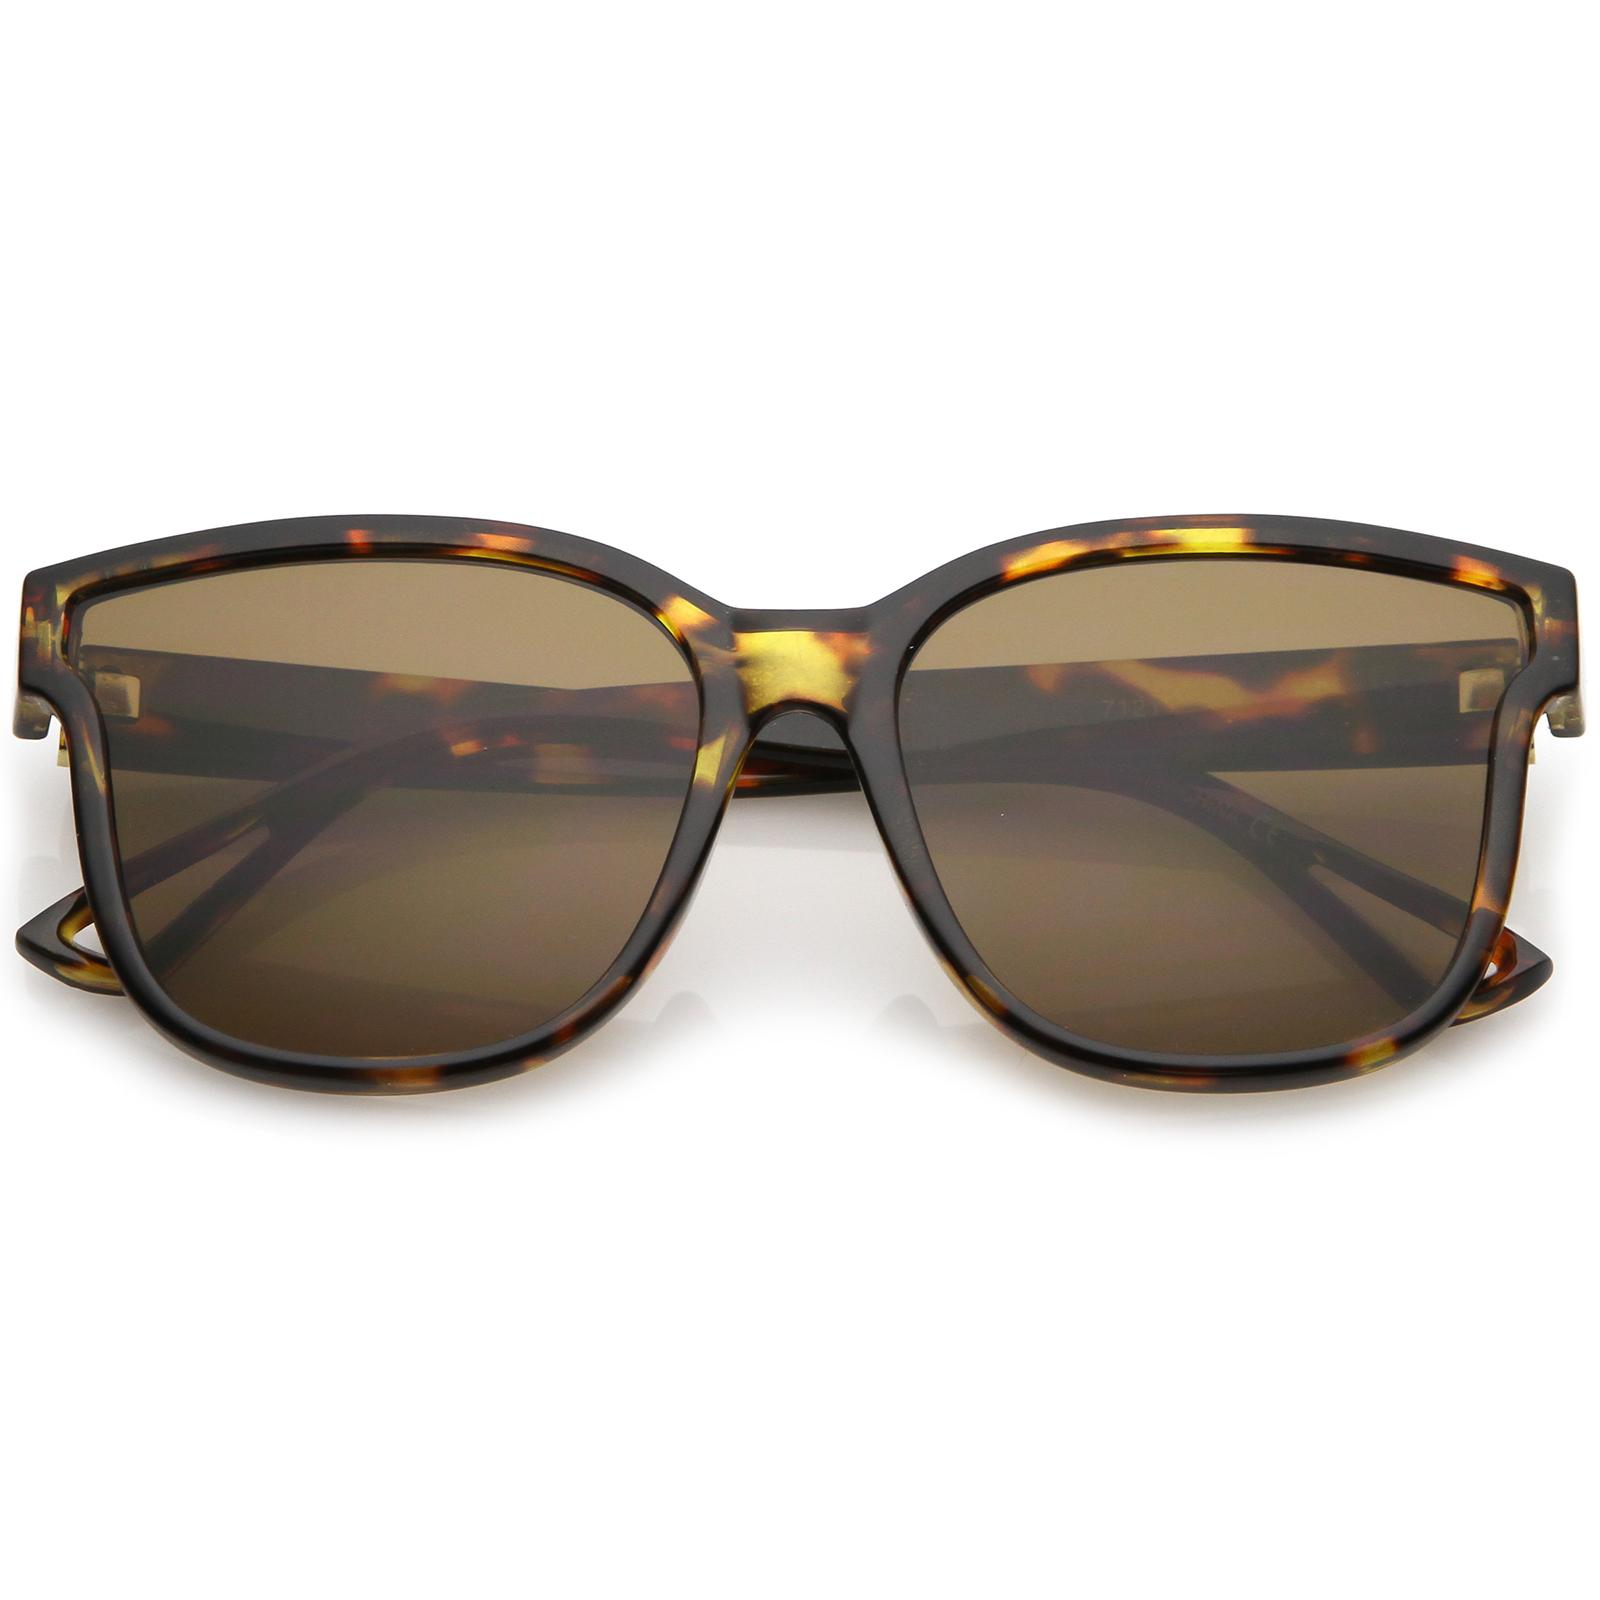 sunglassLA - Women's Horn Rim Metal Accent Square Flat Lens Cat Eye Sunglasses 55mm - 55mm